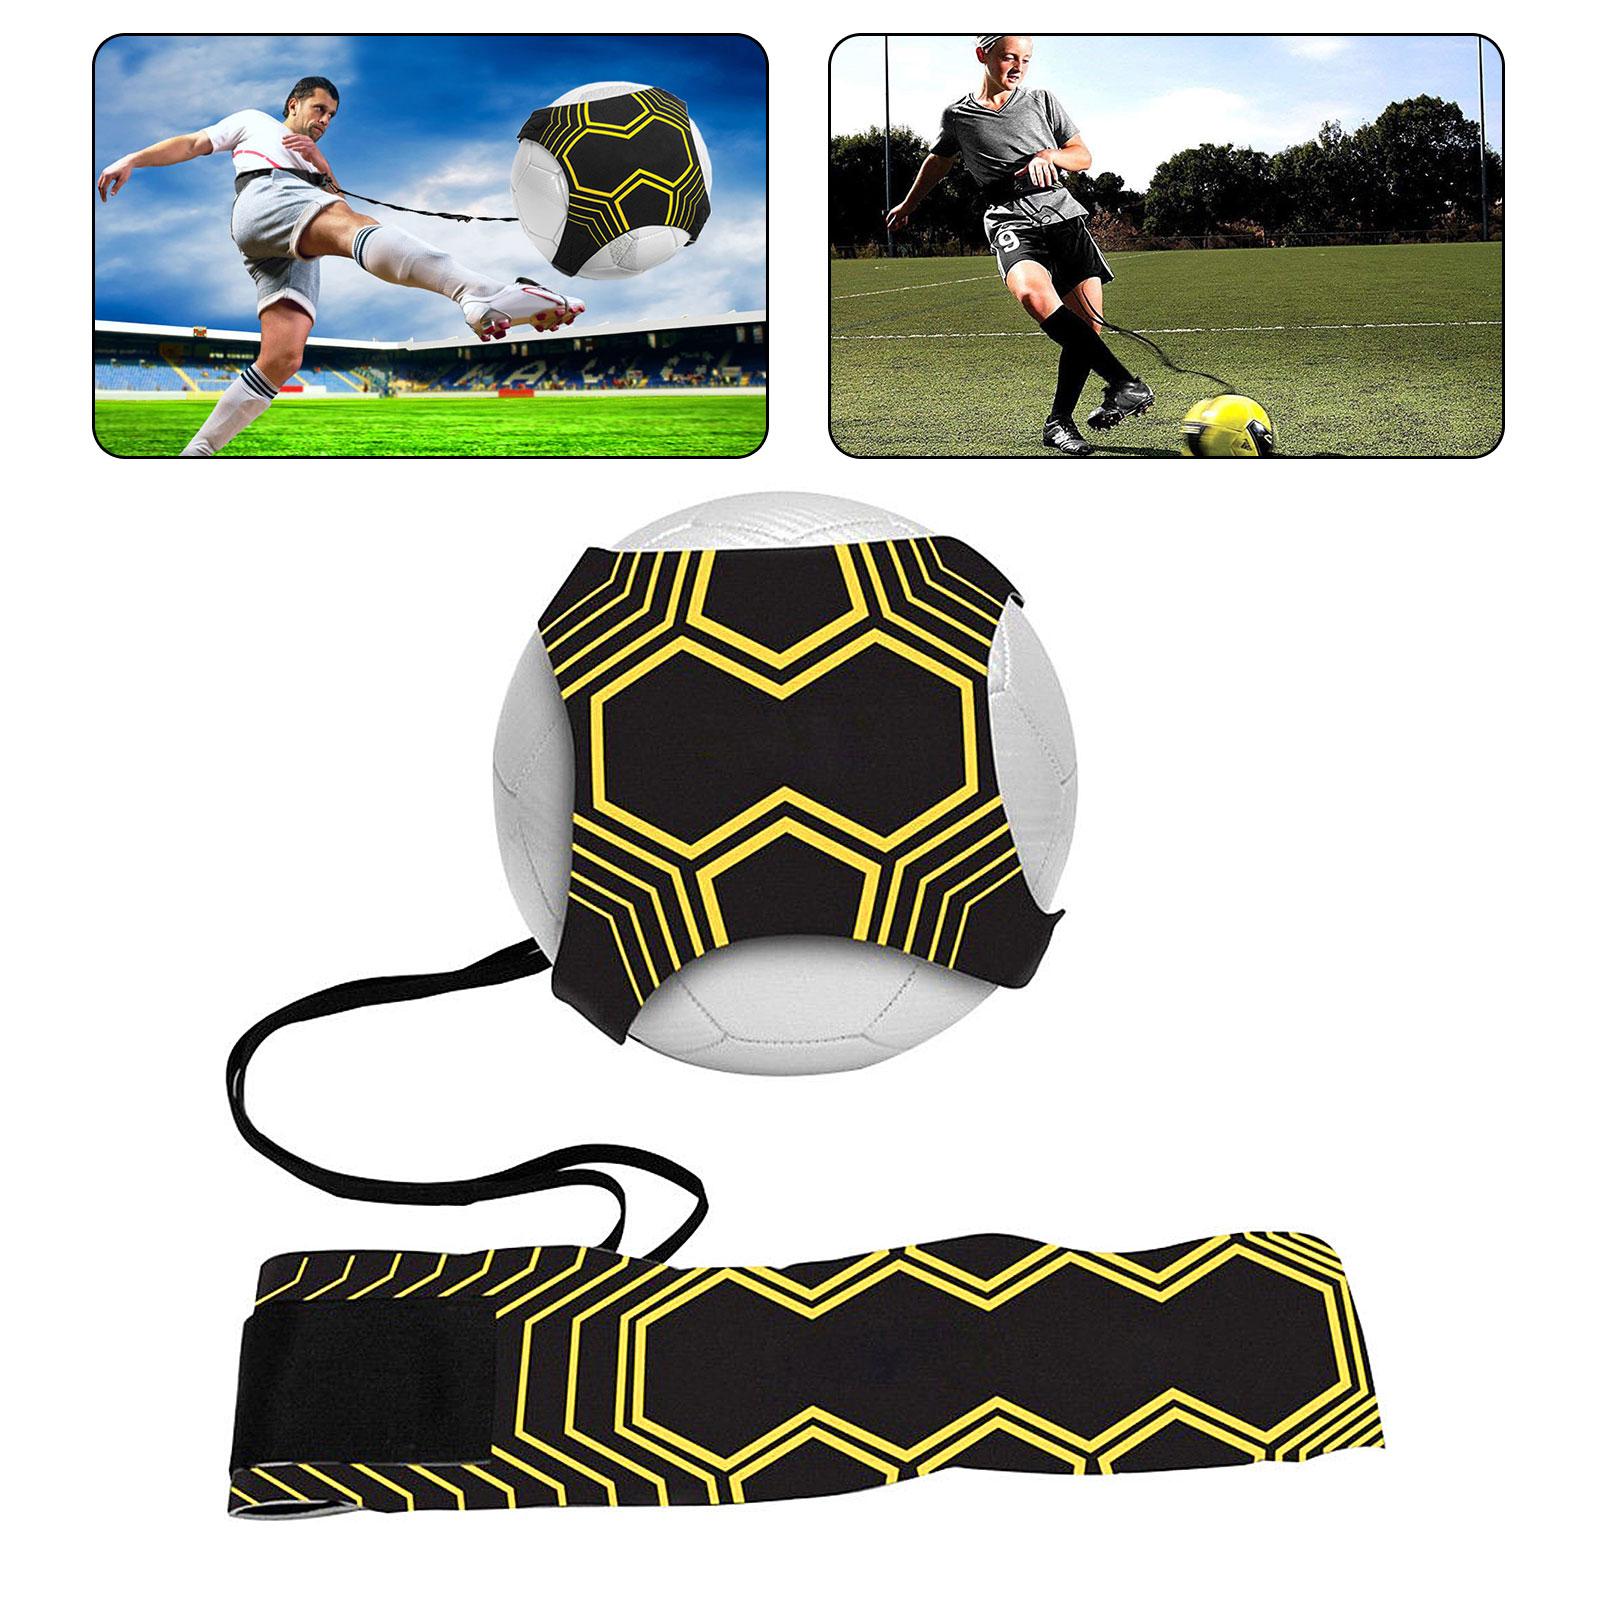 Football Ball Control training Device Soccer Goal Kick Practice Belt Equipment